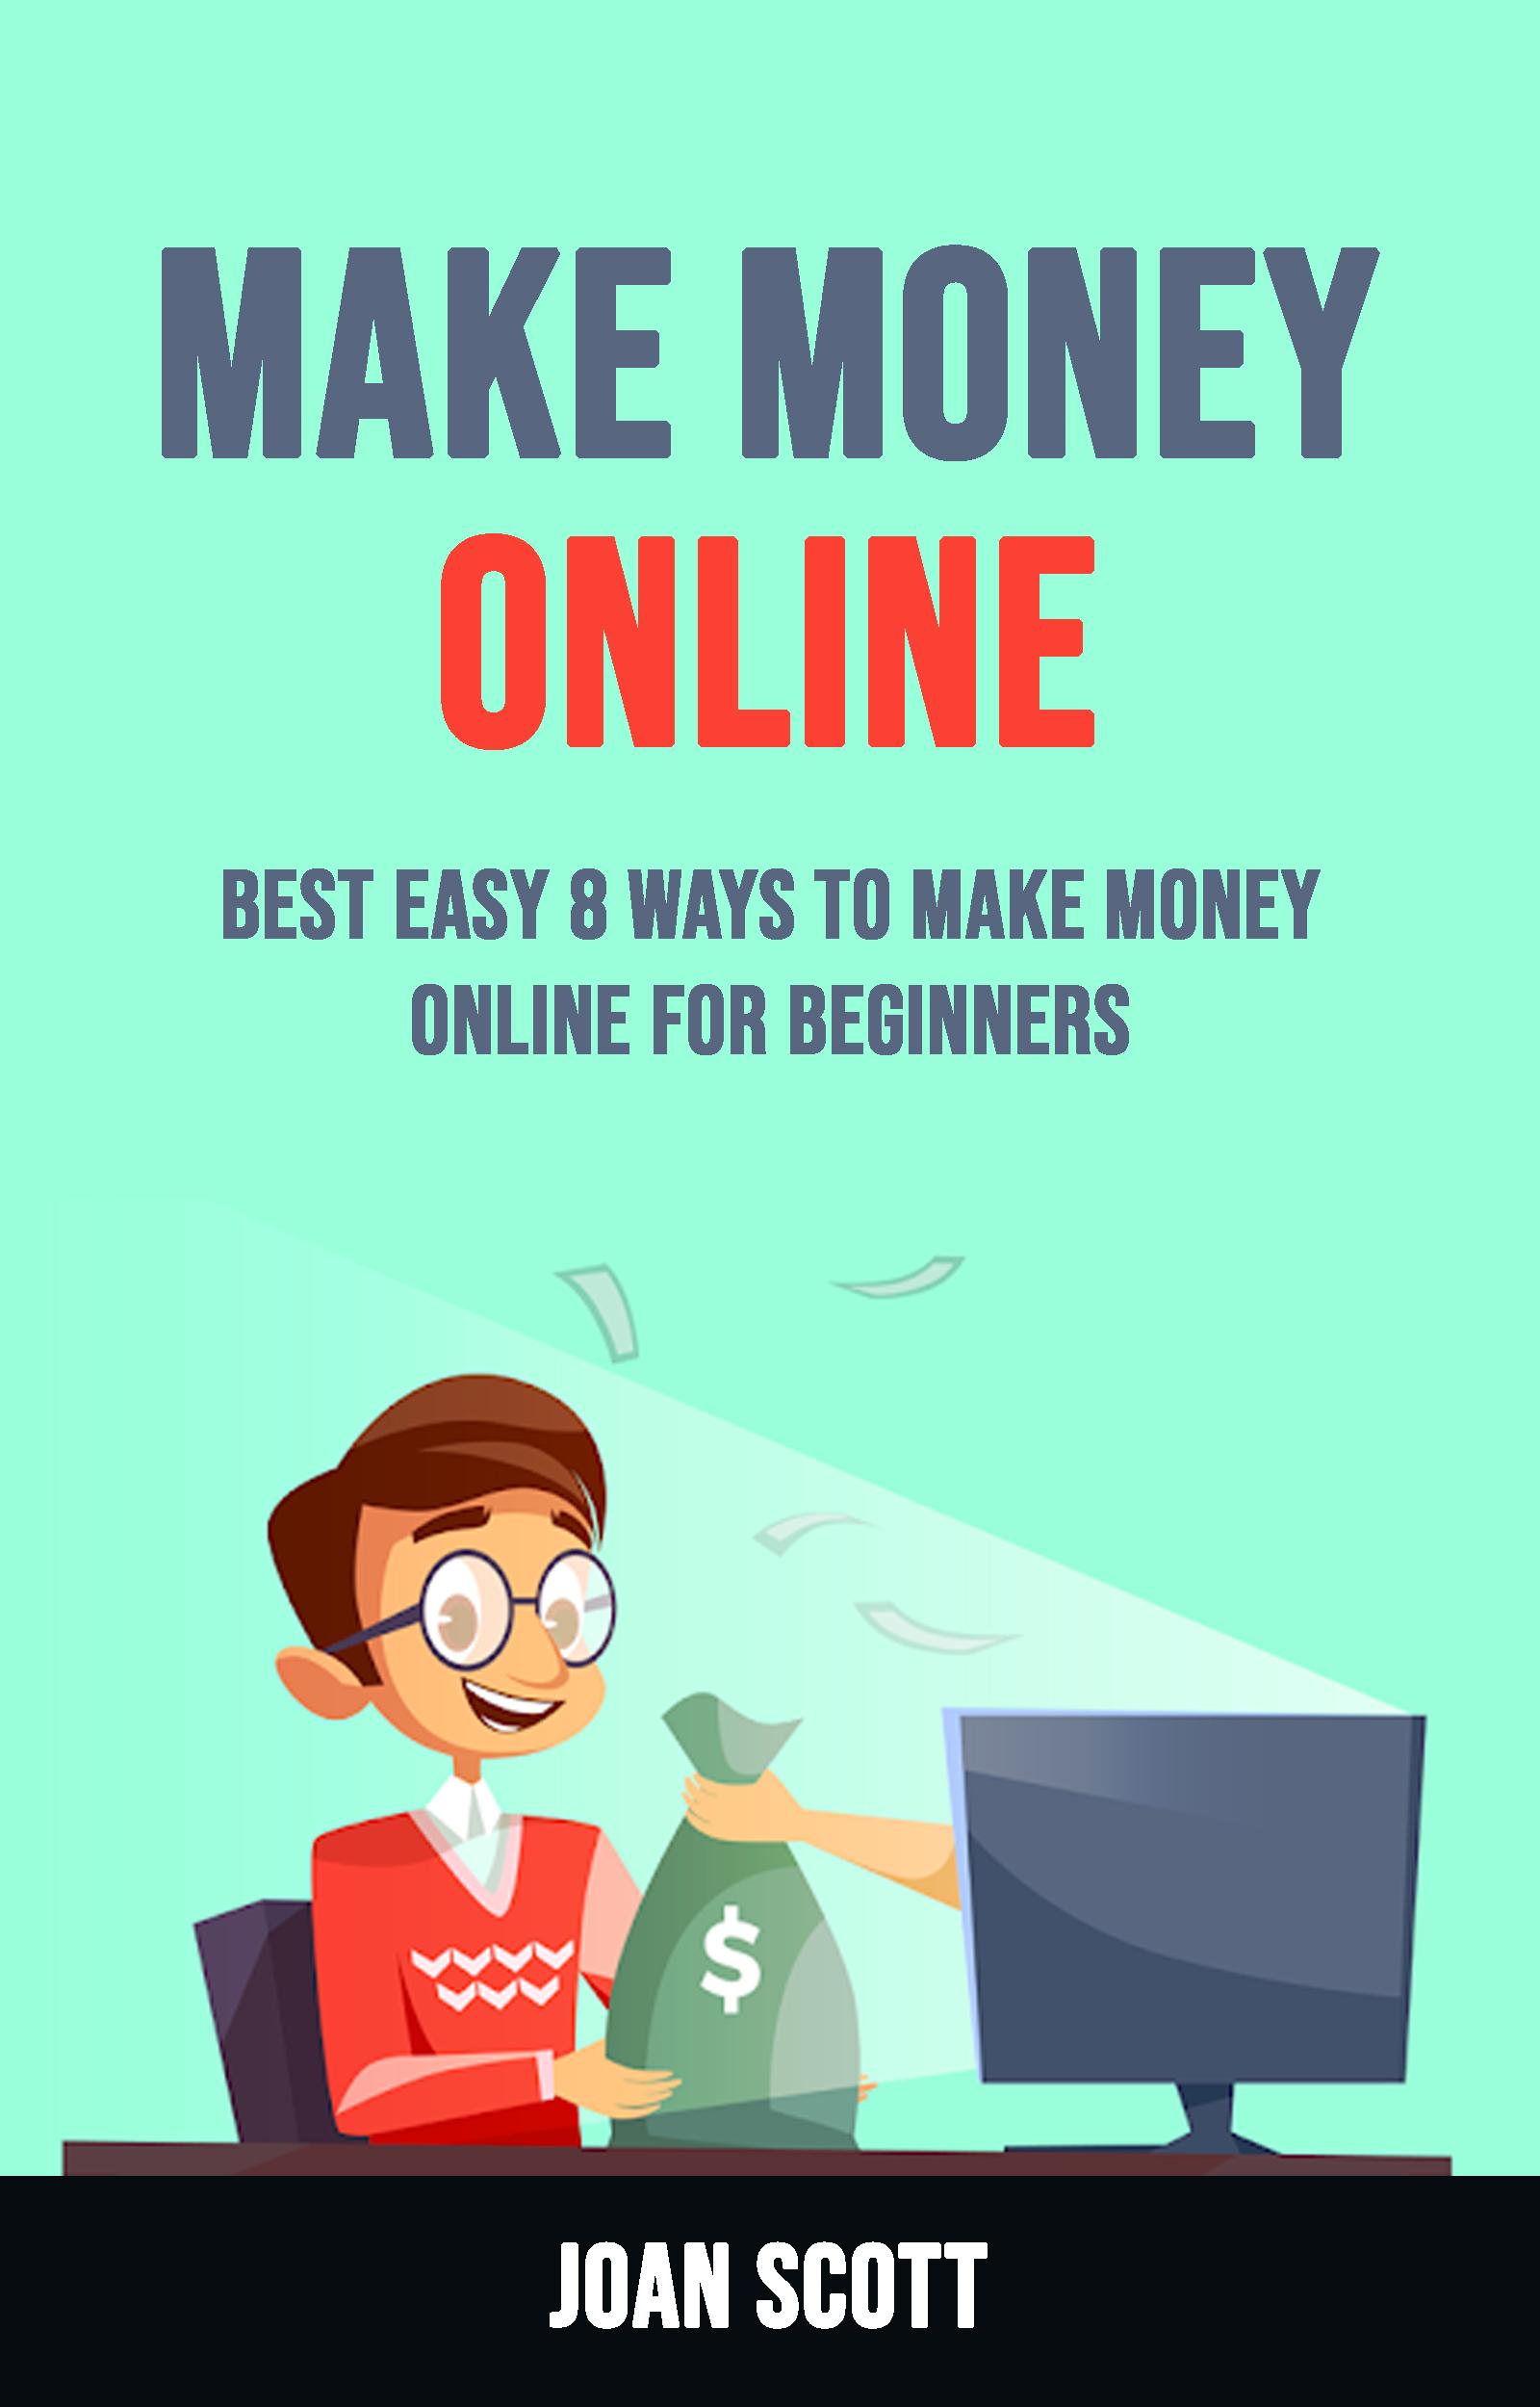 Make money online: best easy 8 ways to make money online for beginners